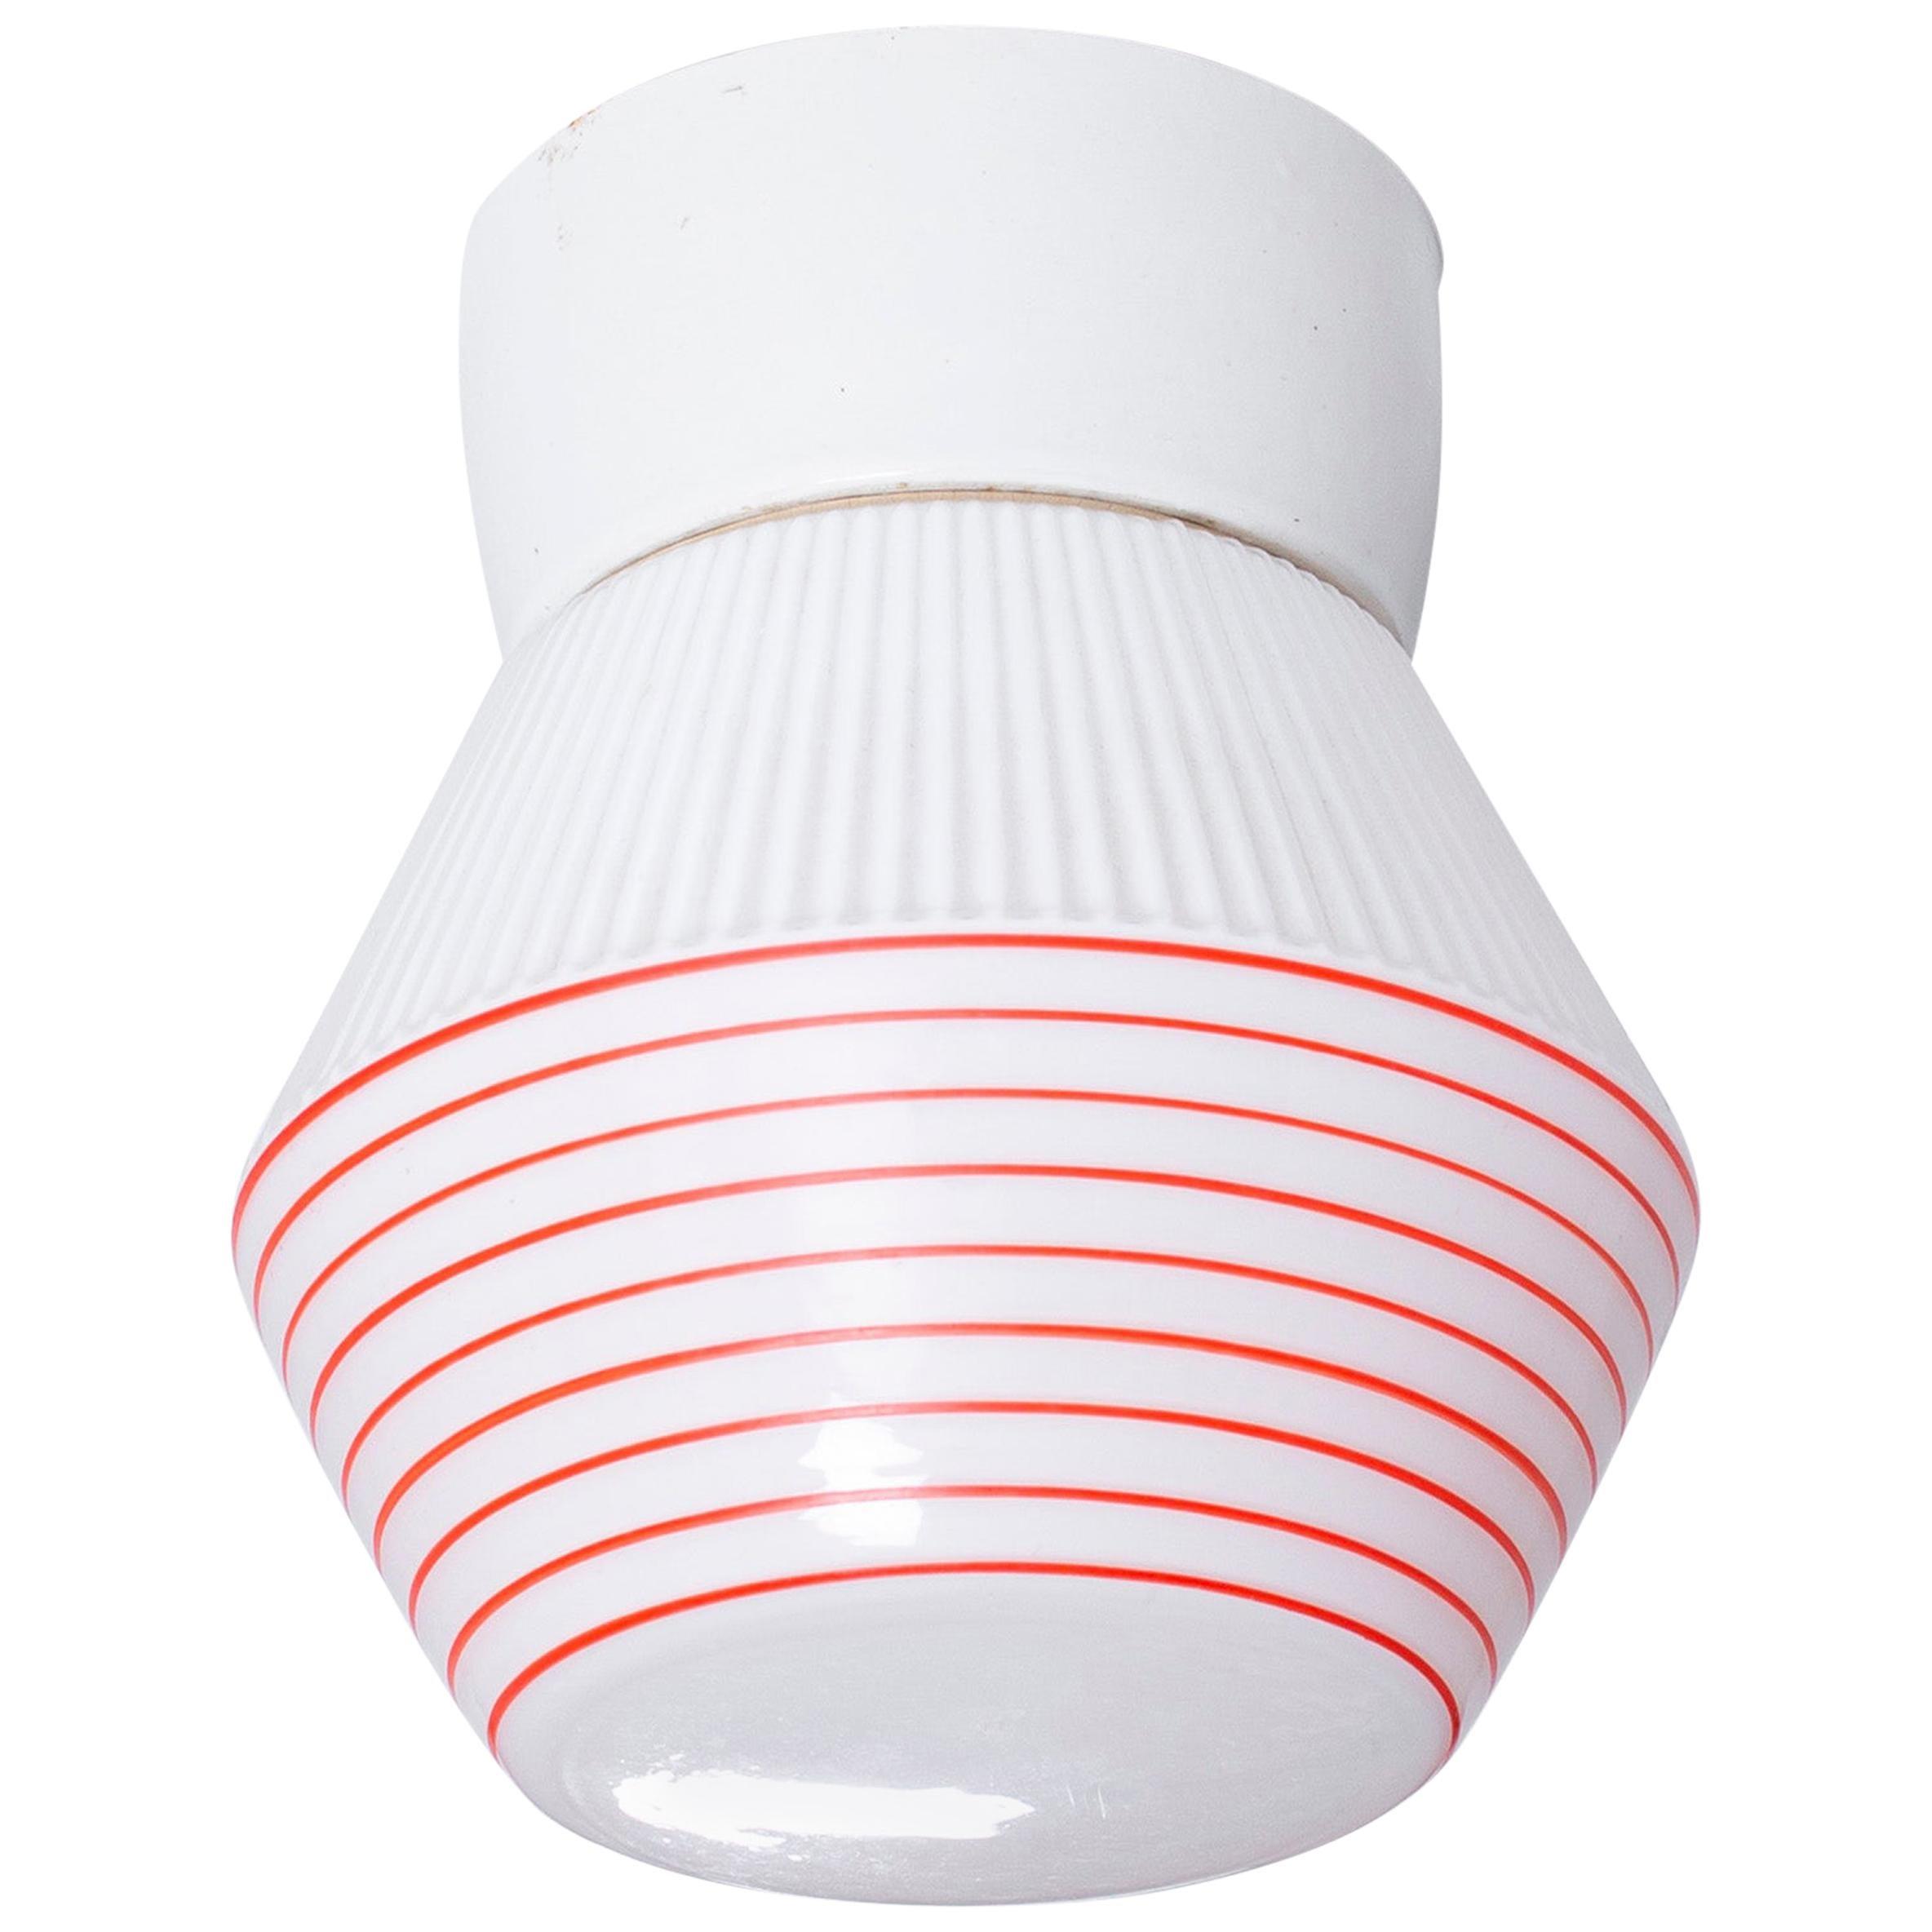 Scandinavian Functionalist Flushmount Ceiling Light, 1950s